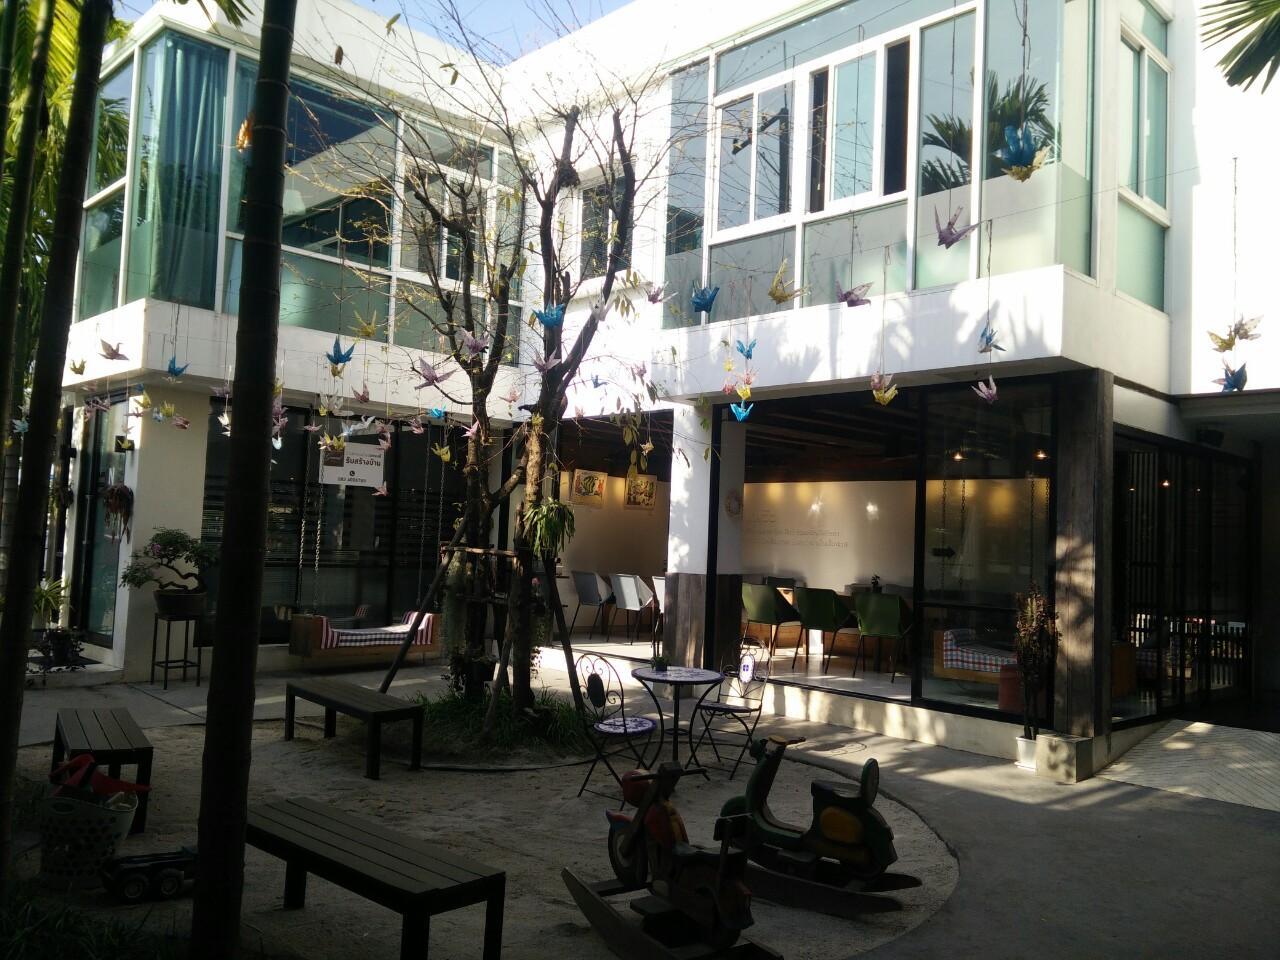 Kin Lom Chom View